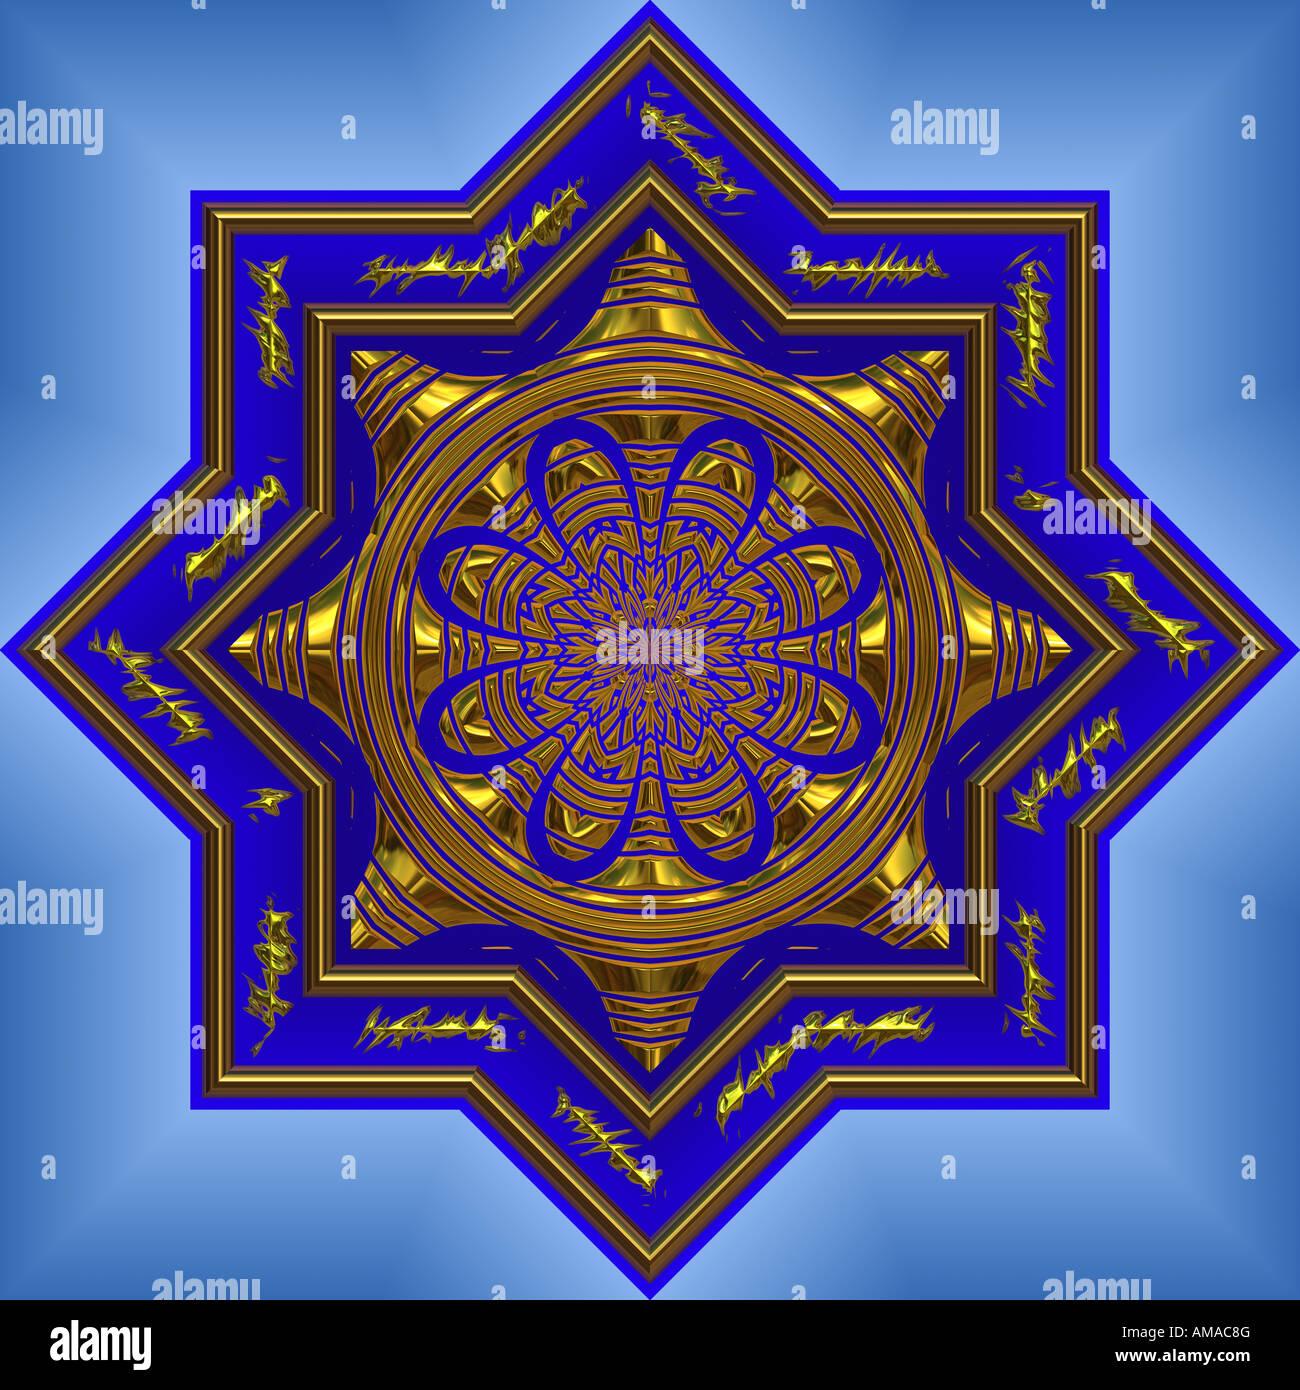 a big bright beautiful blue mandala with golden design - Stock Image